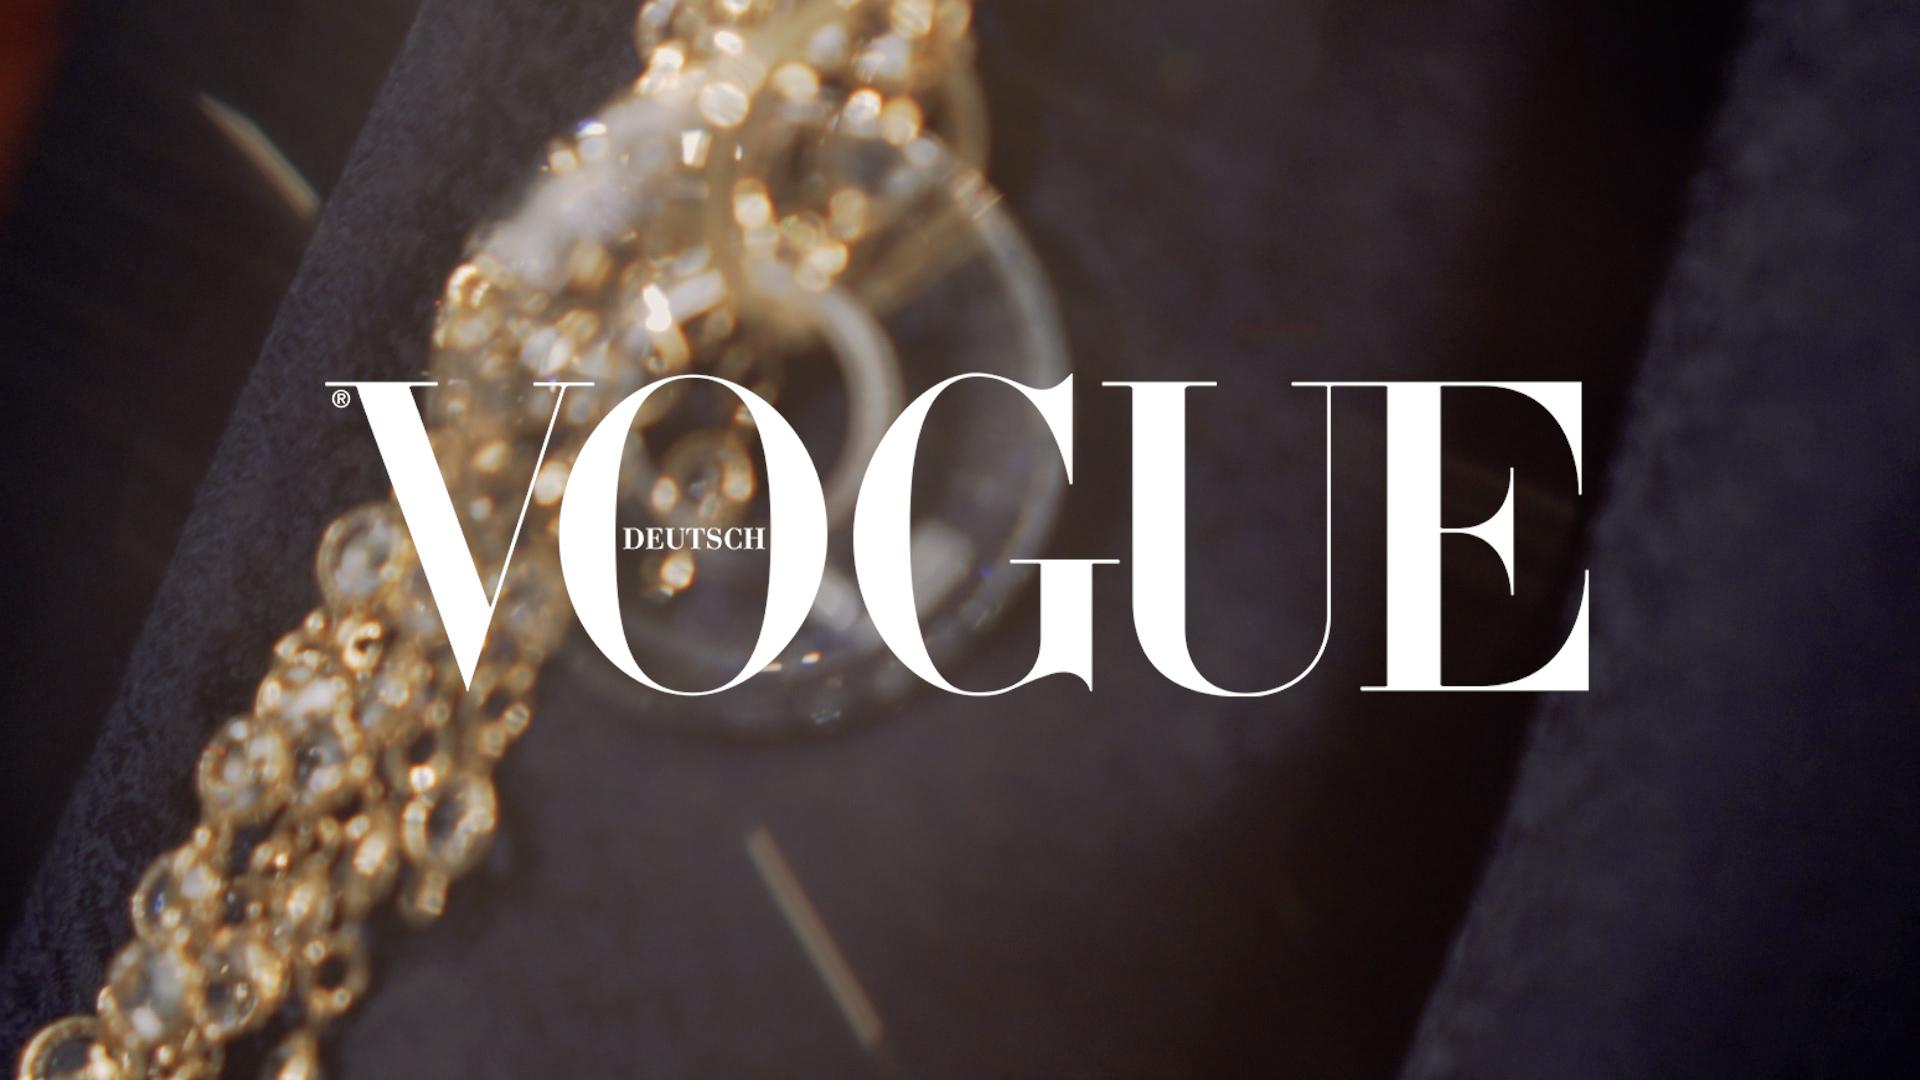 Vogue [Swarovski]